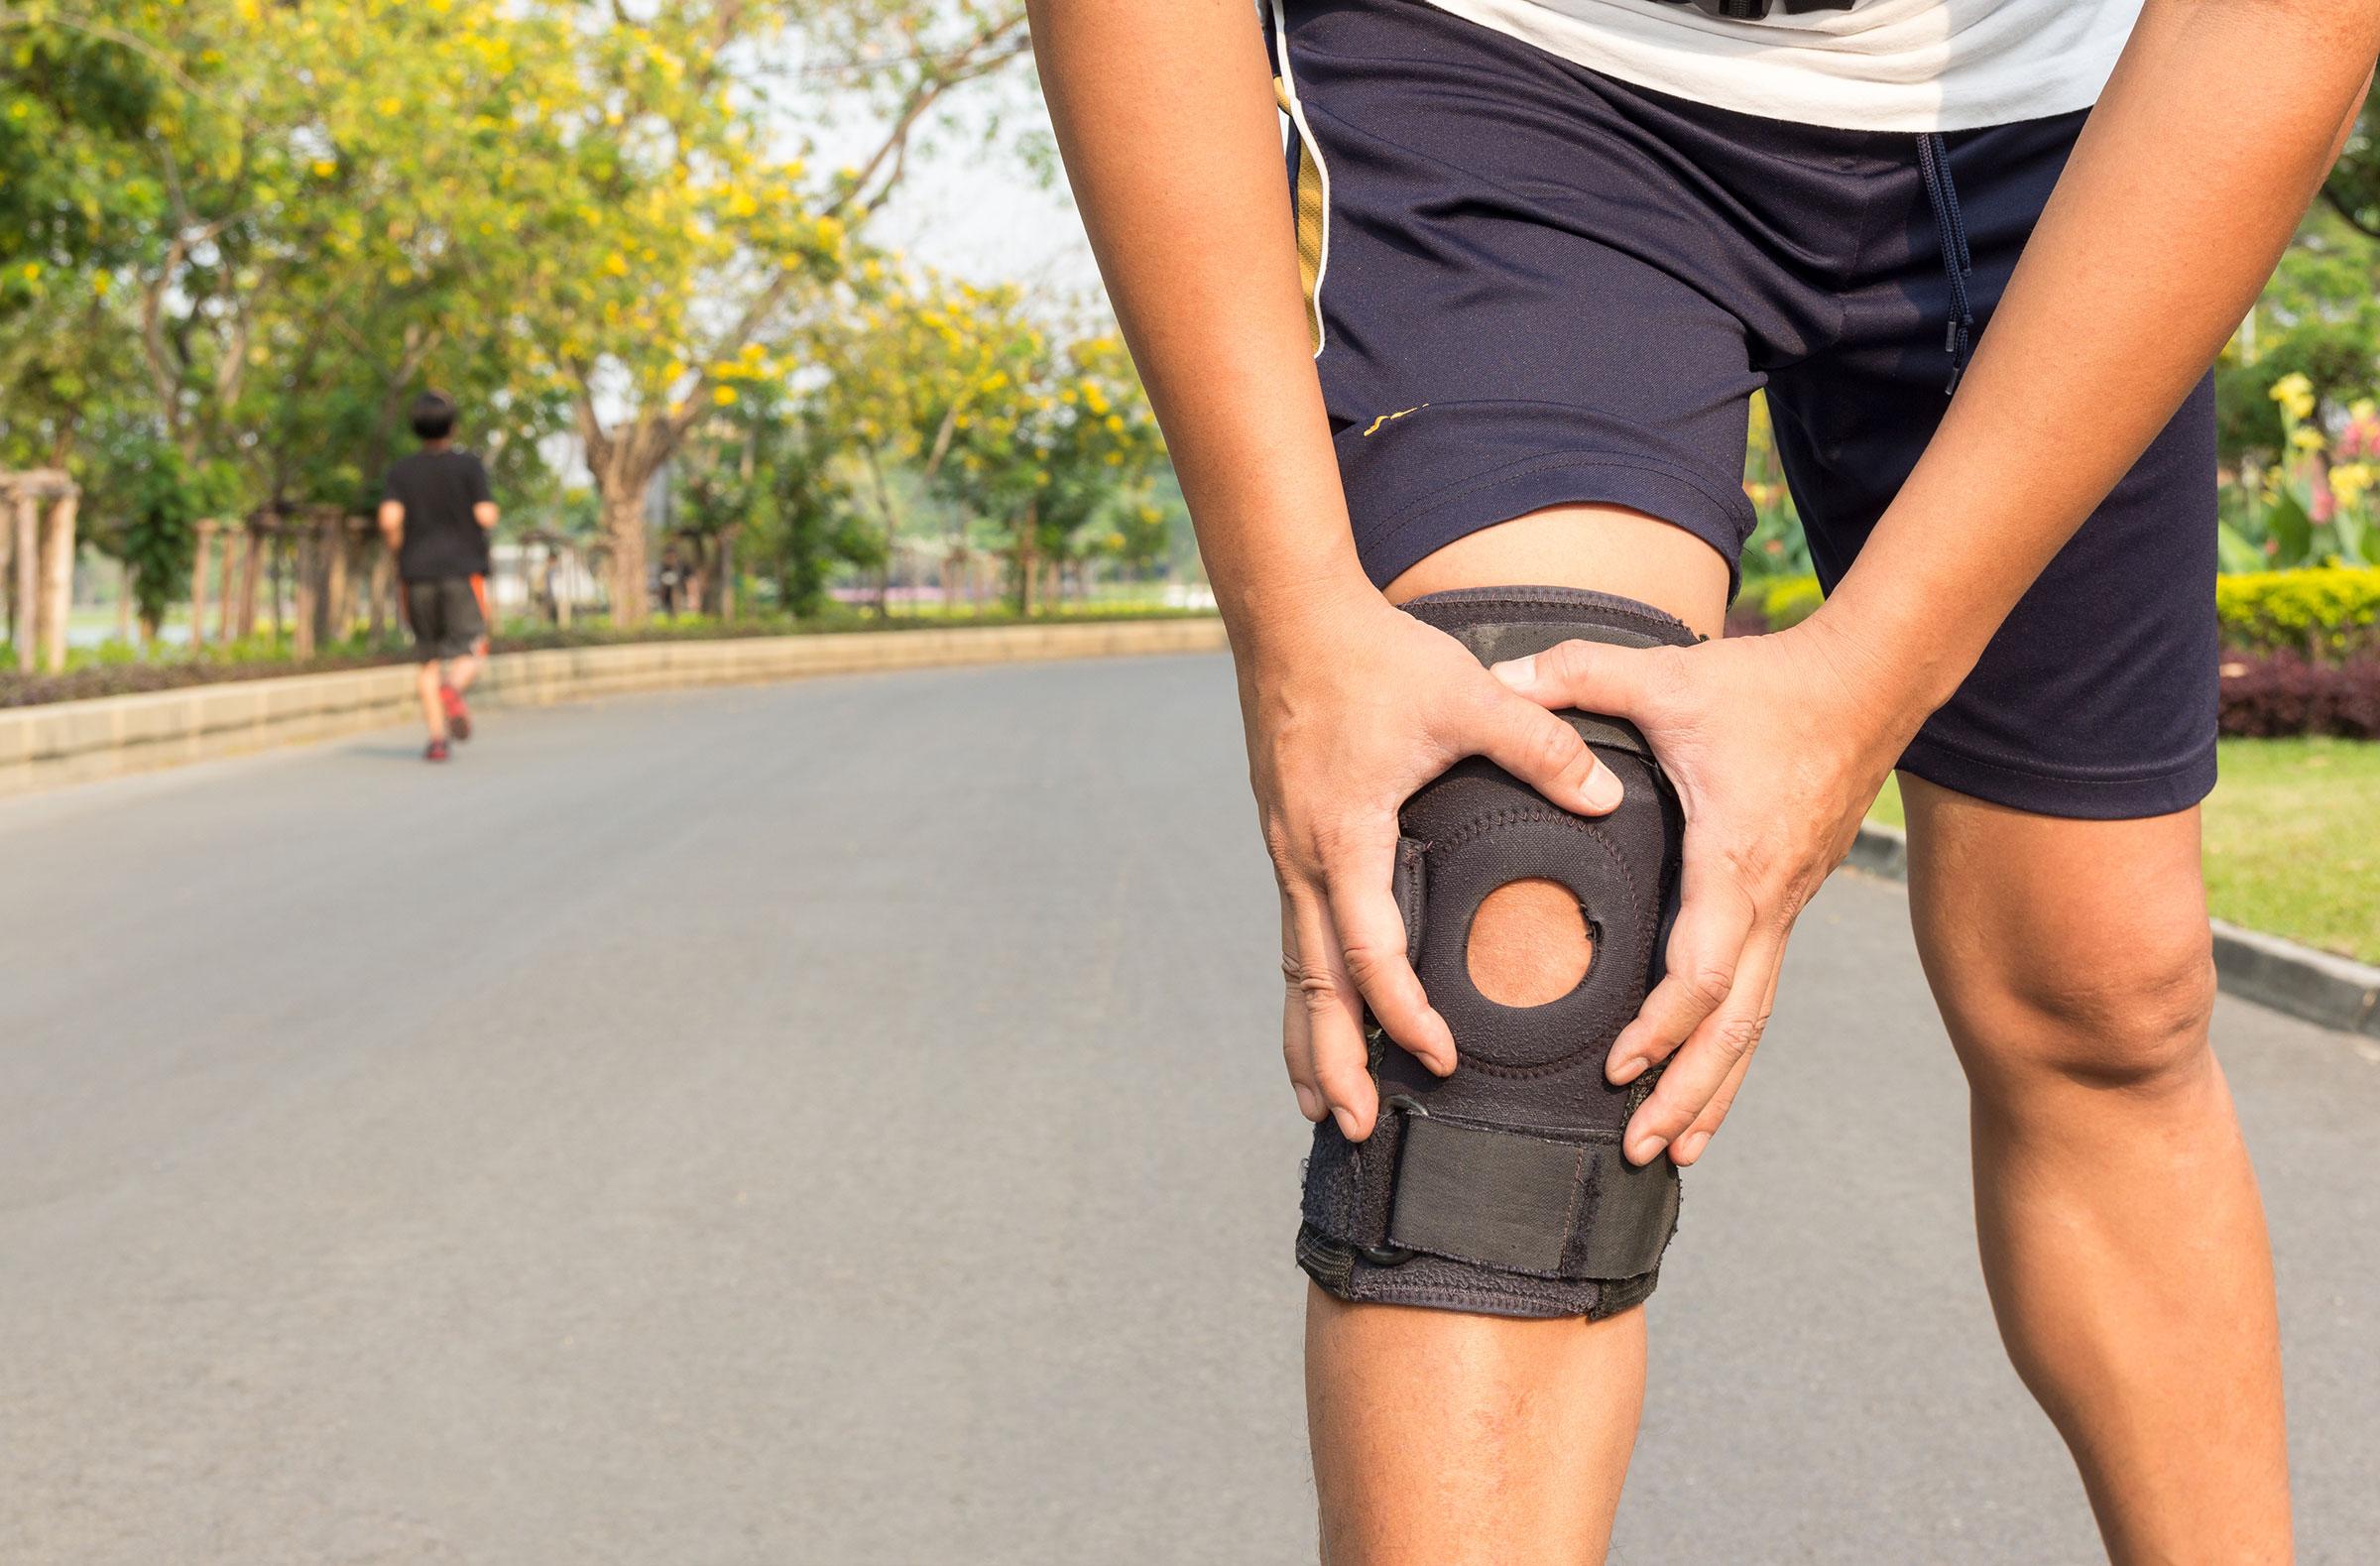 Crop image of man's knee with knee braces